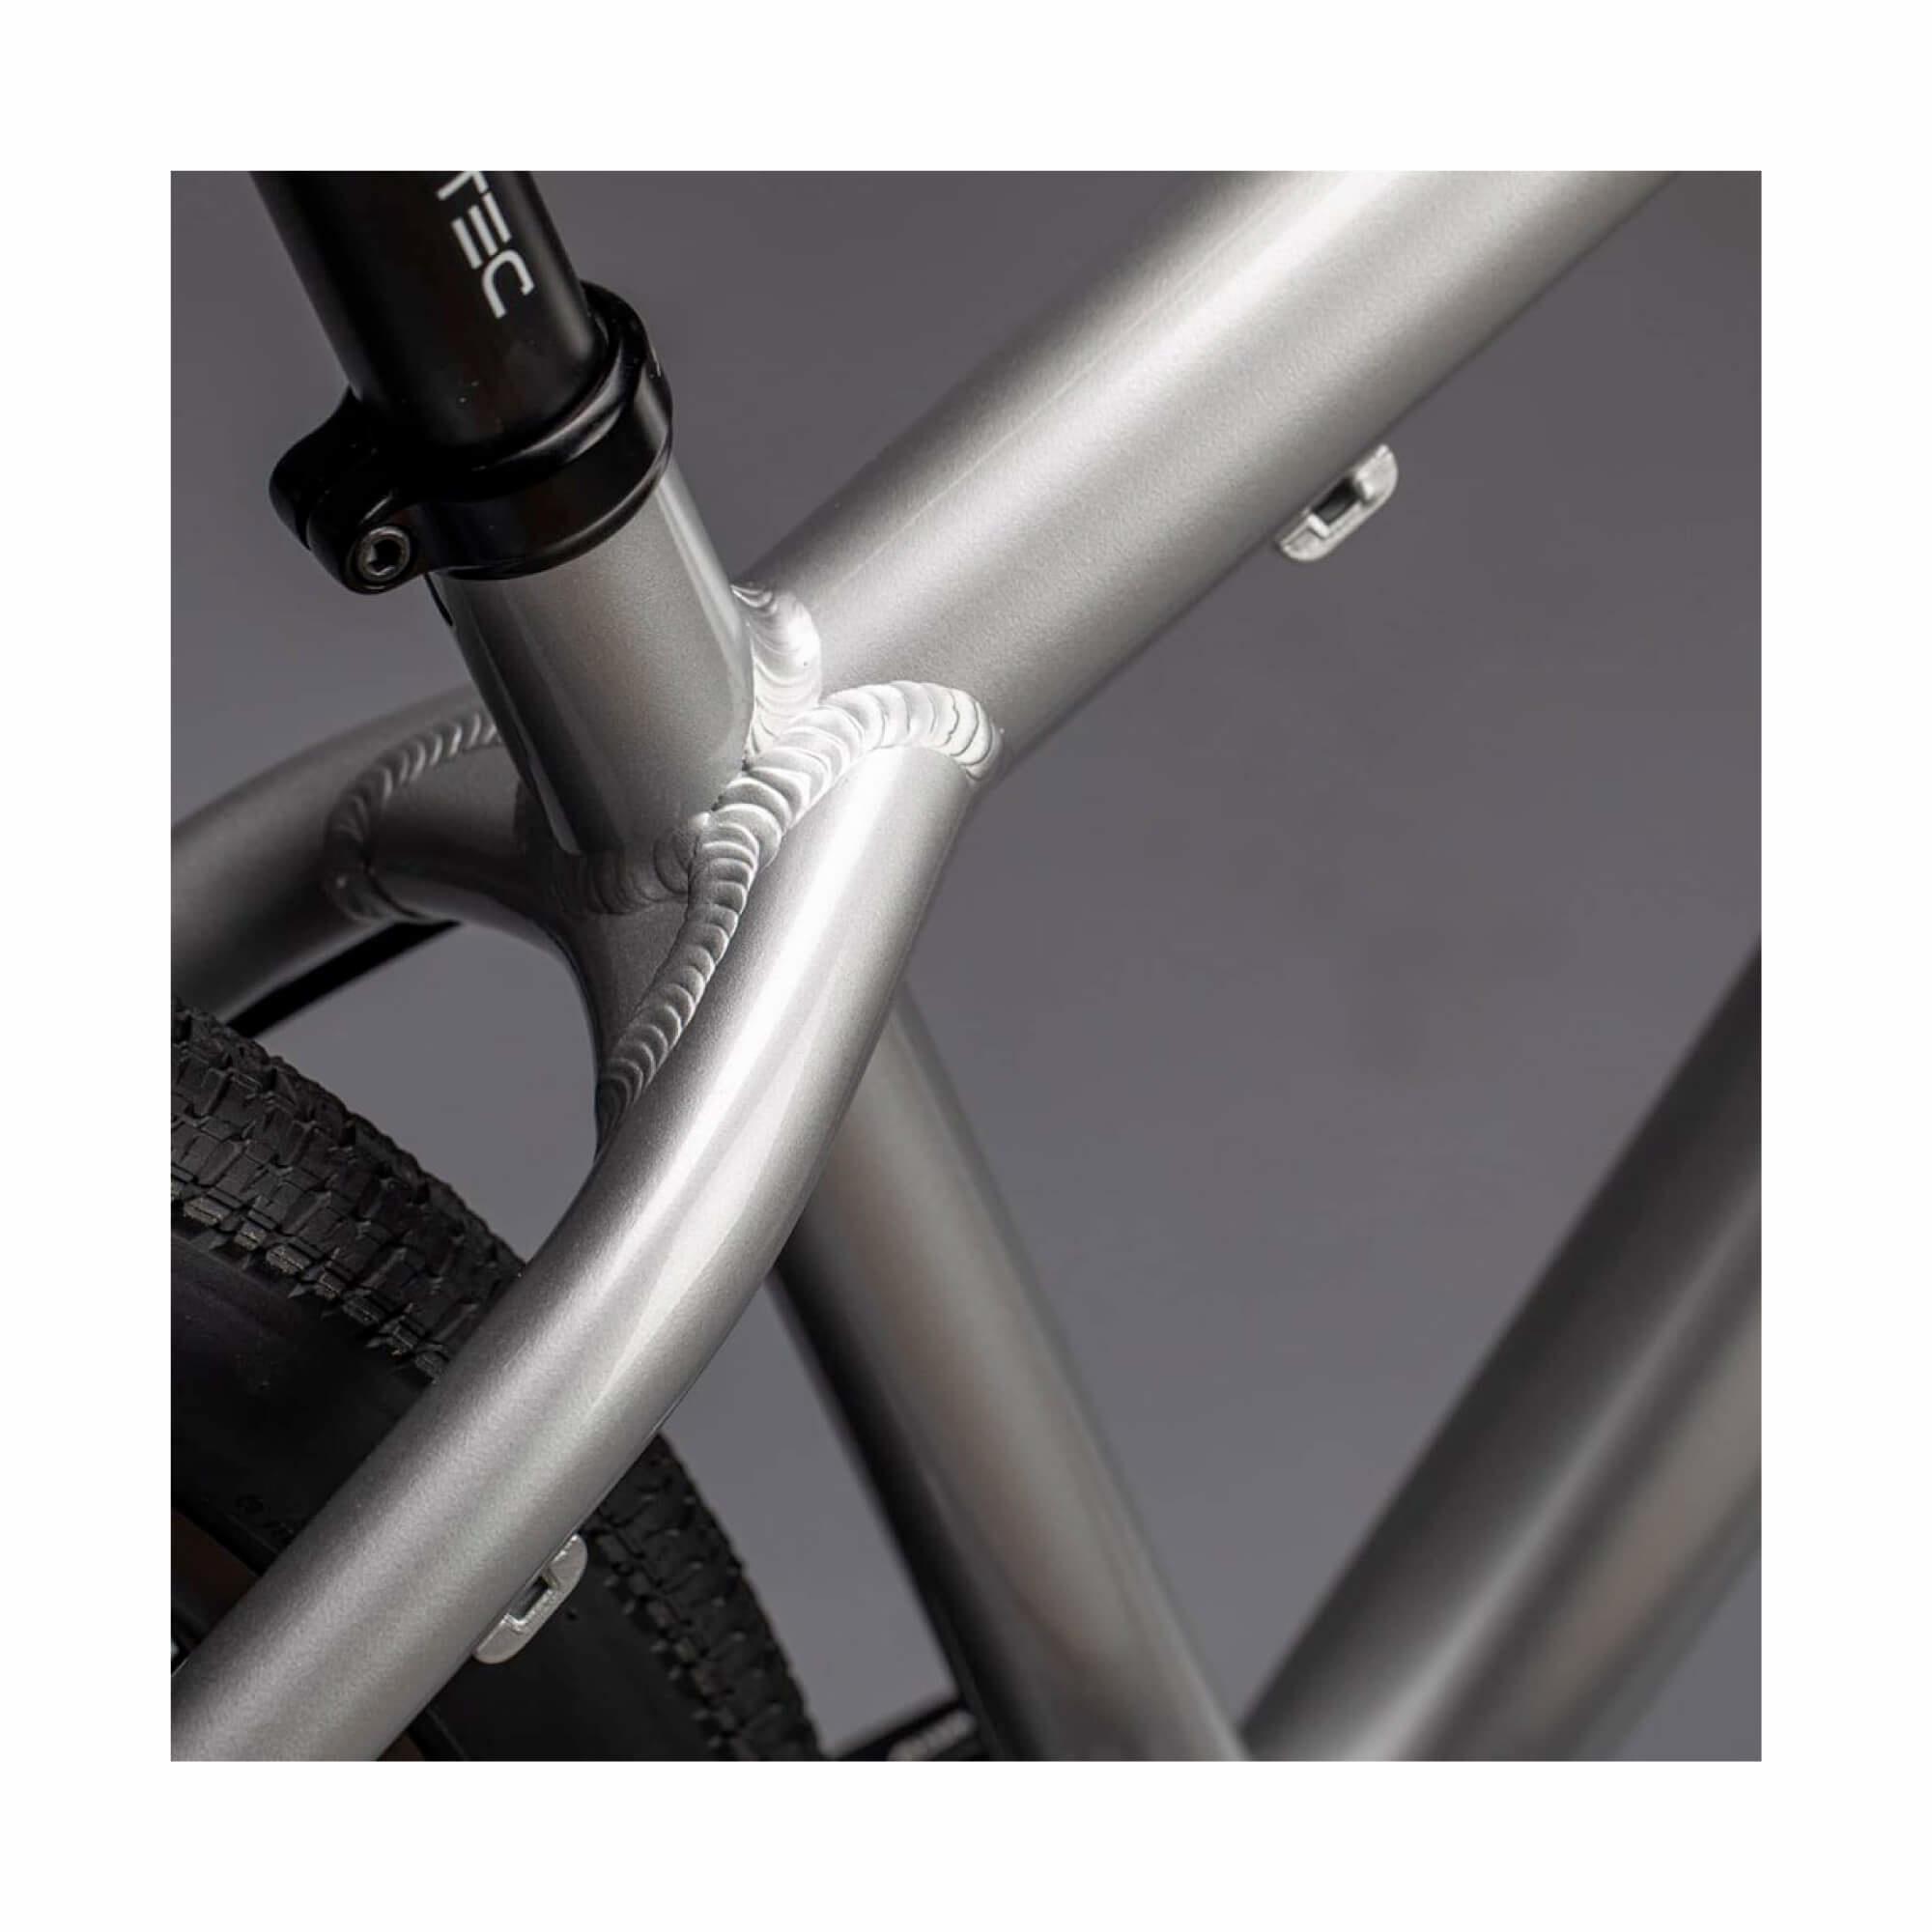 Jackal Frame 142 T/A Silver 2021-4